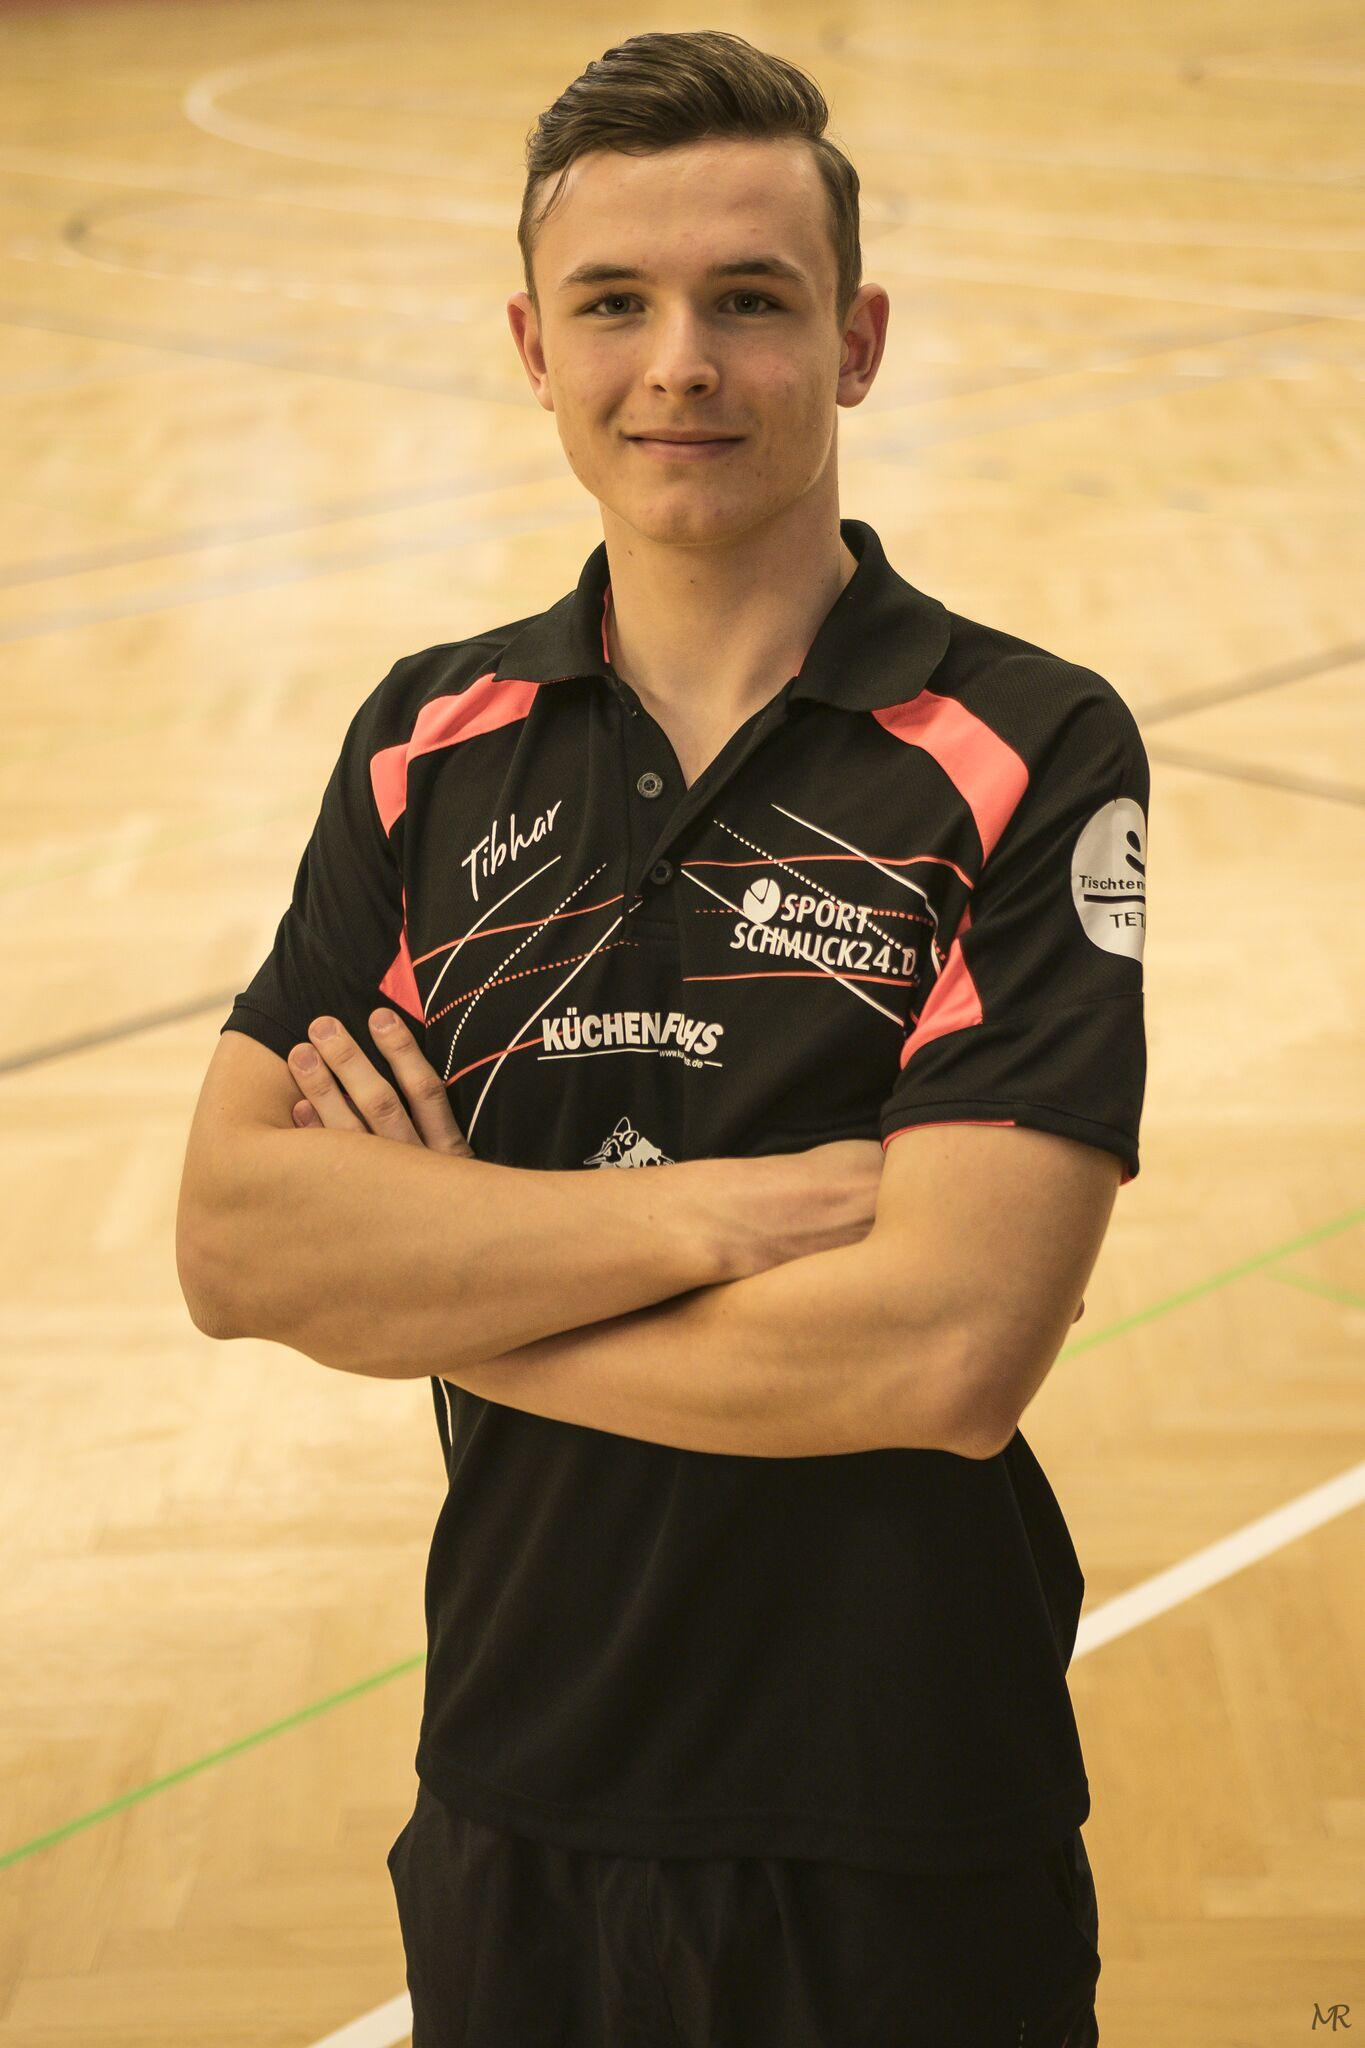 Nils Goerke